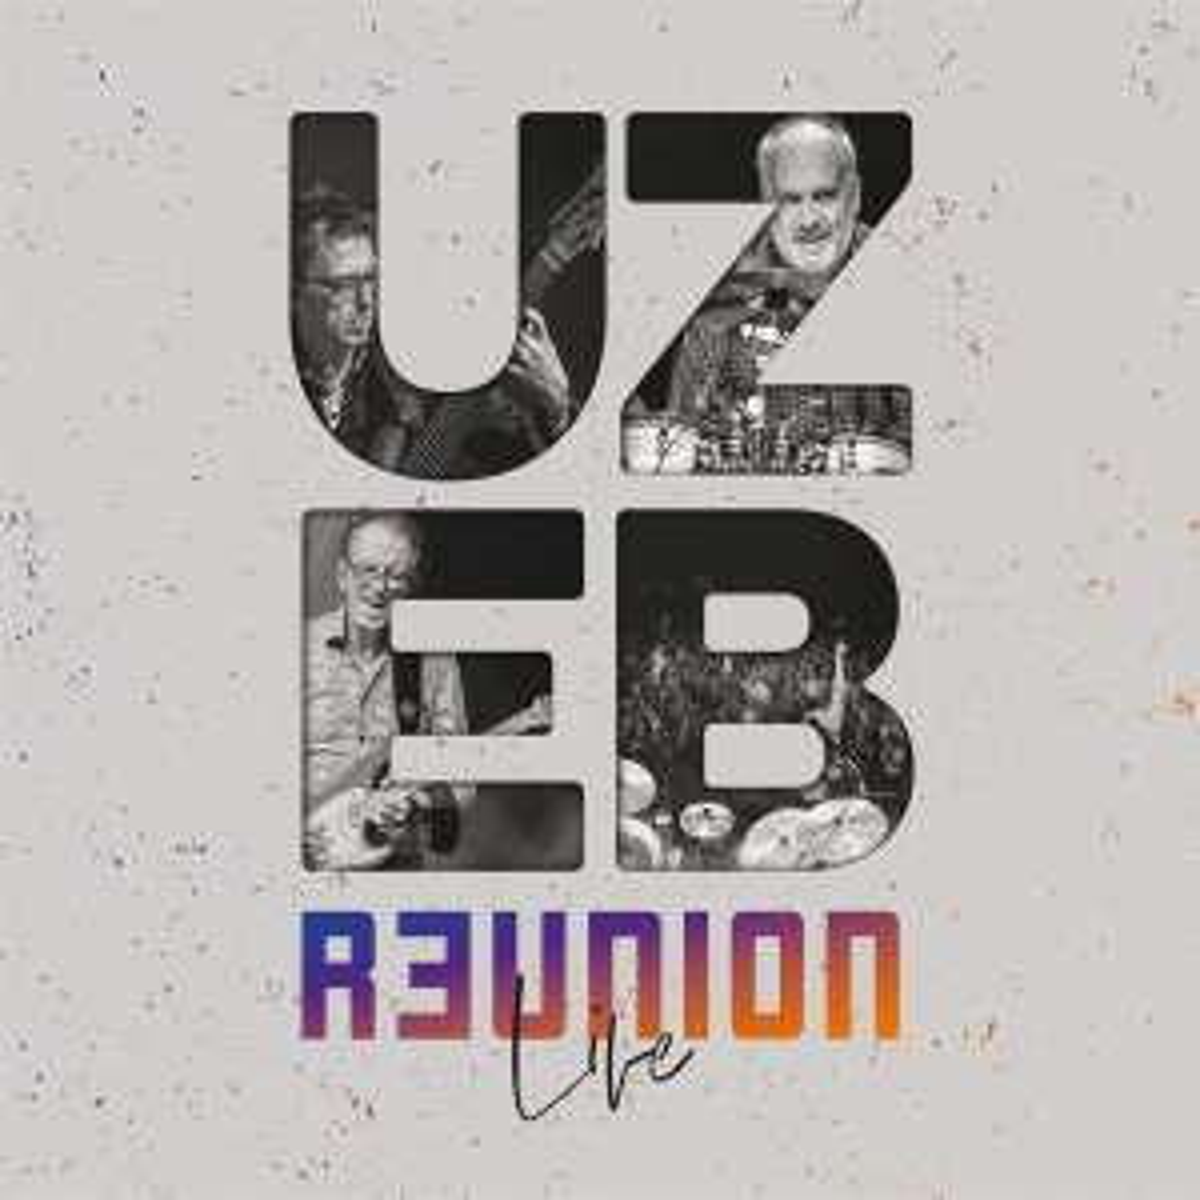 Uzeb - R3union Live 2 x LP Vinyl - £4.70 Prime / £7.69 non-Prime @ Amazon